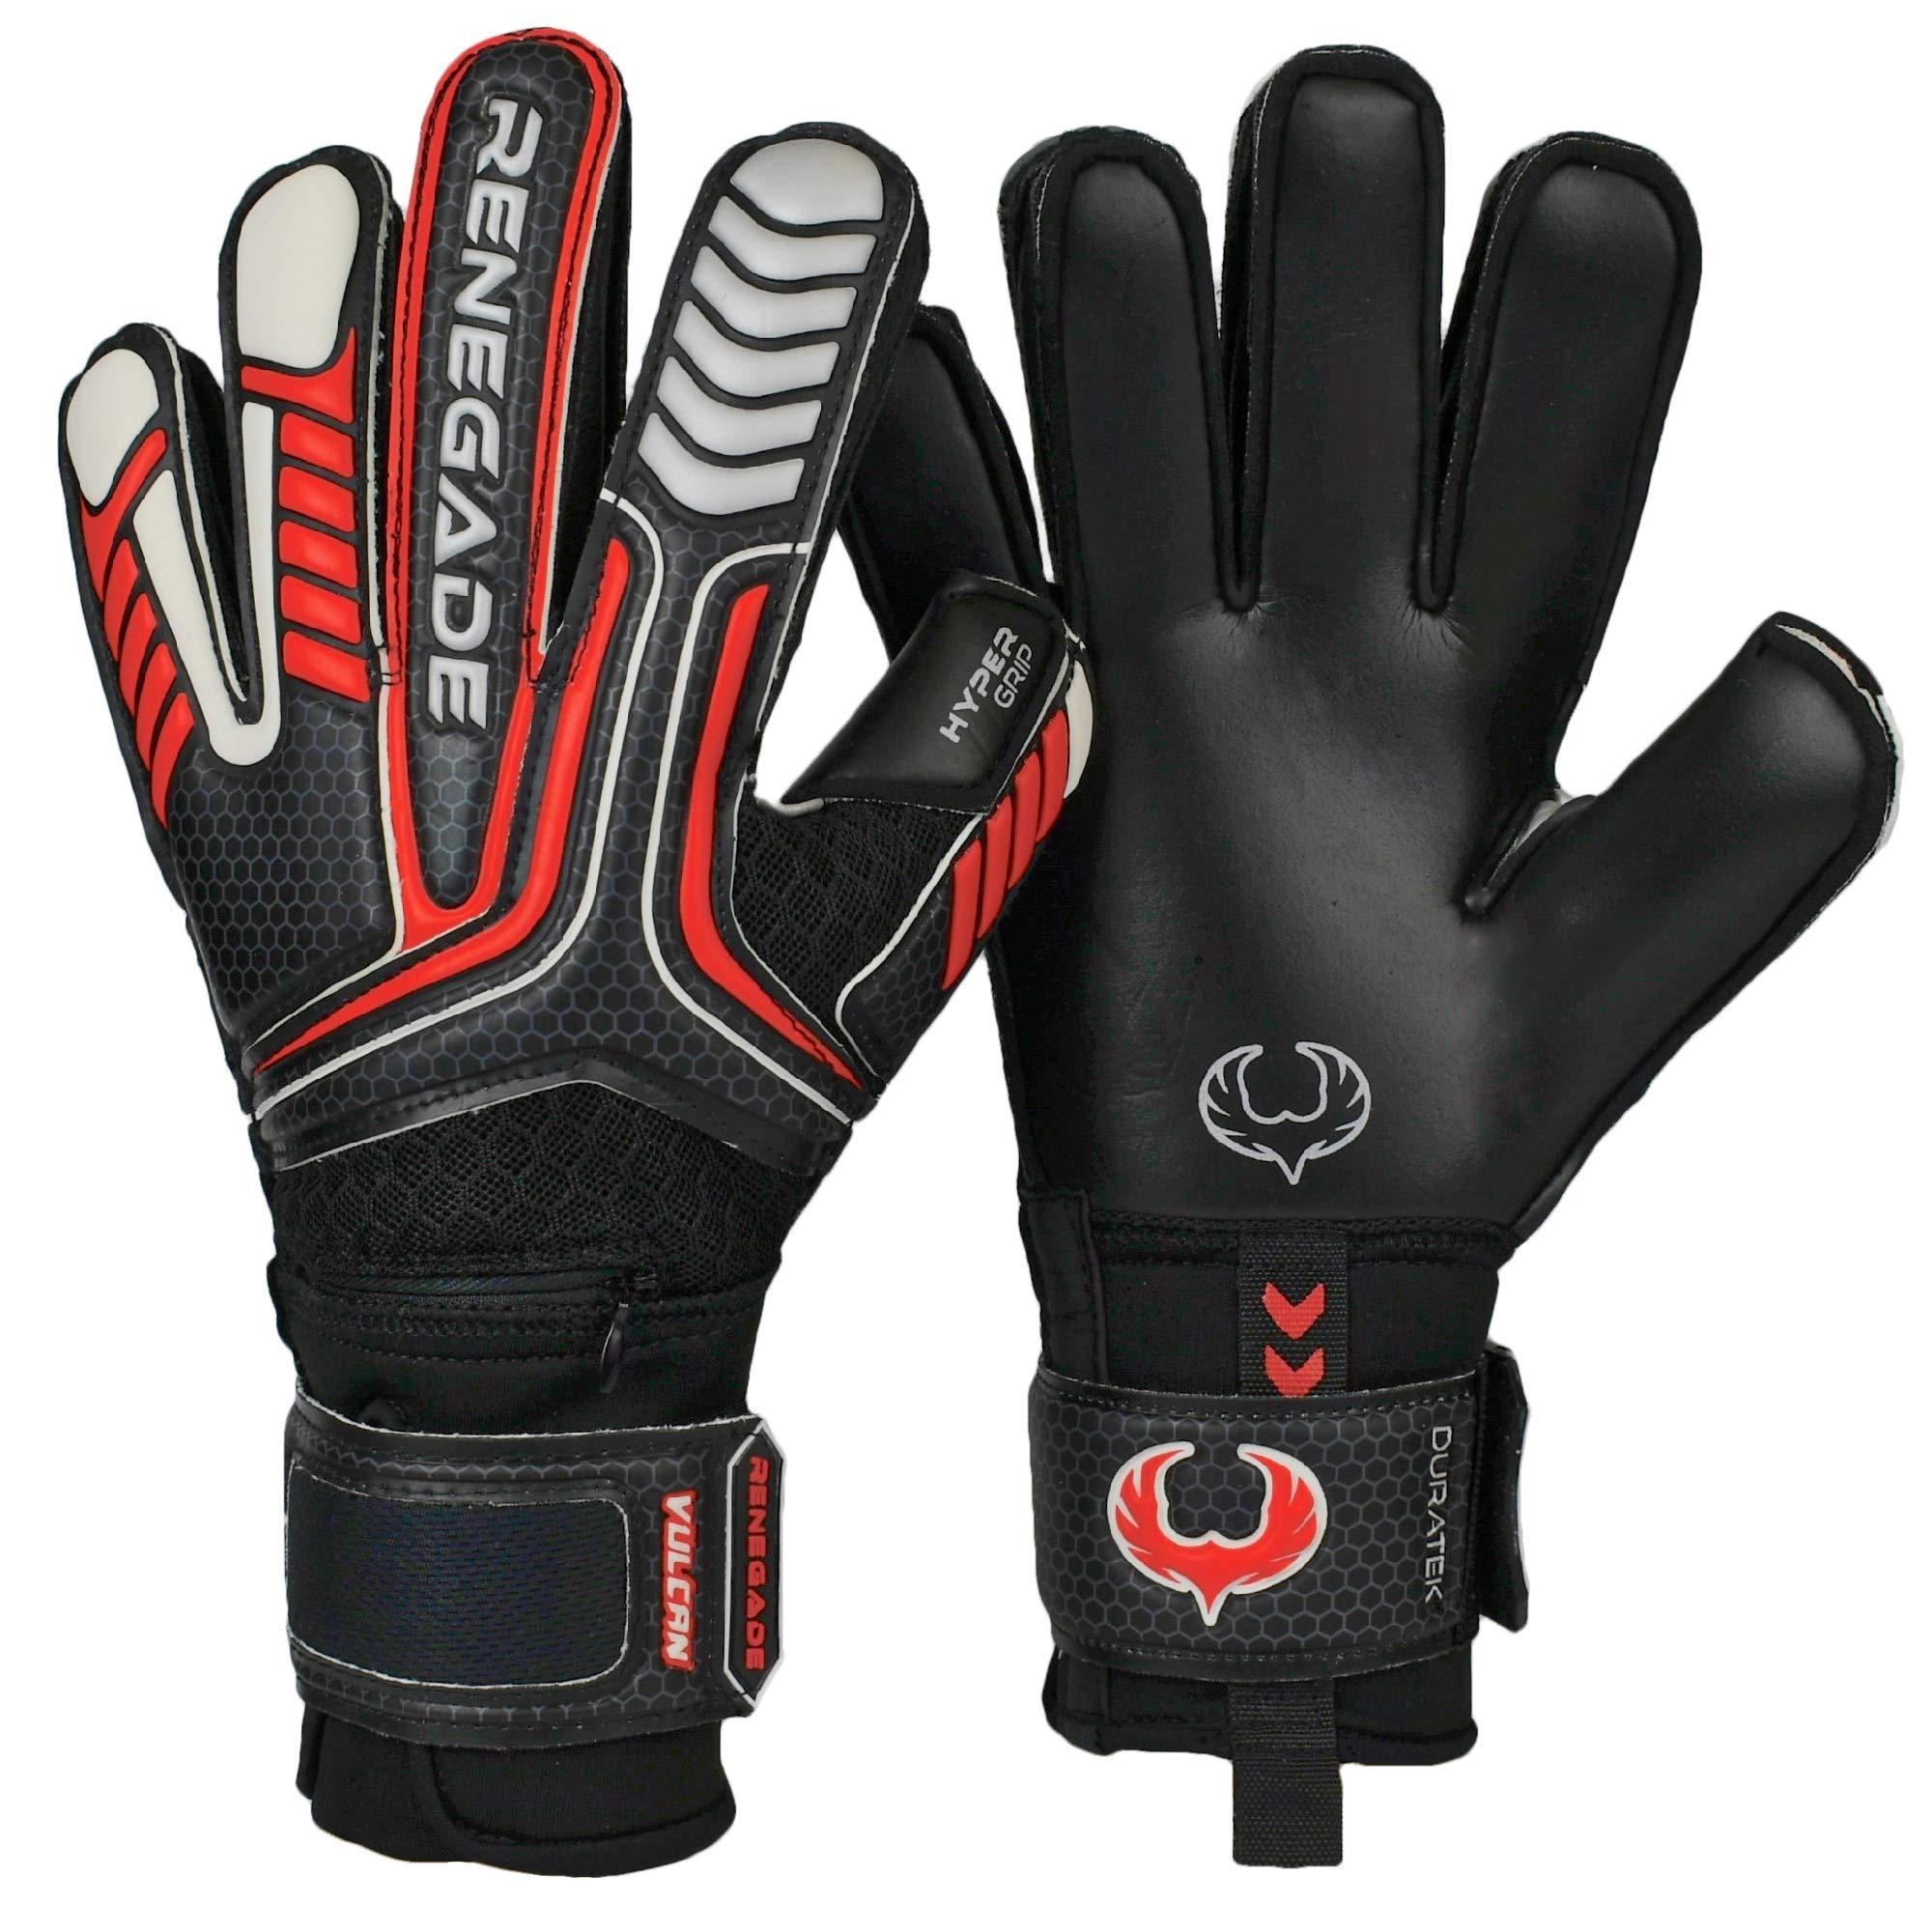 Renegade GK Vulcan Raze Flat Cut Level 3 Outdoor/Indoor Goalie Gloves for Kids with Fingersaves (Size 6) - Kids Soccer Goalie Gloves Youth - Girls & Boys Soccer Gloves Kids - Black & Red